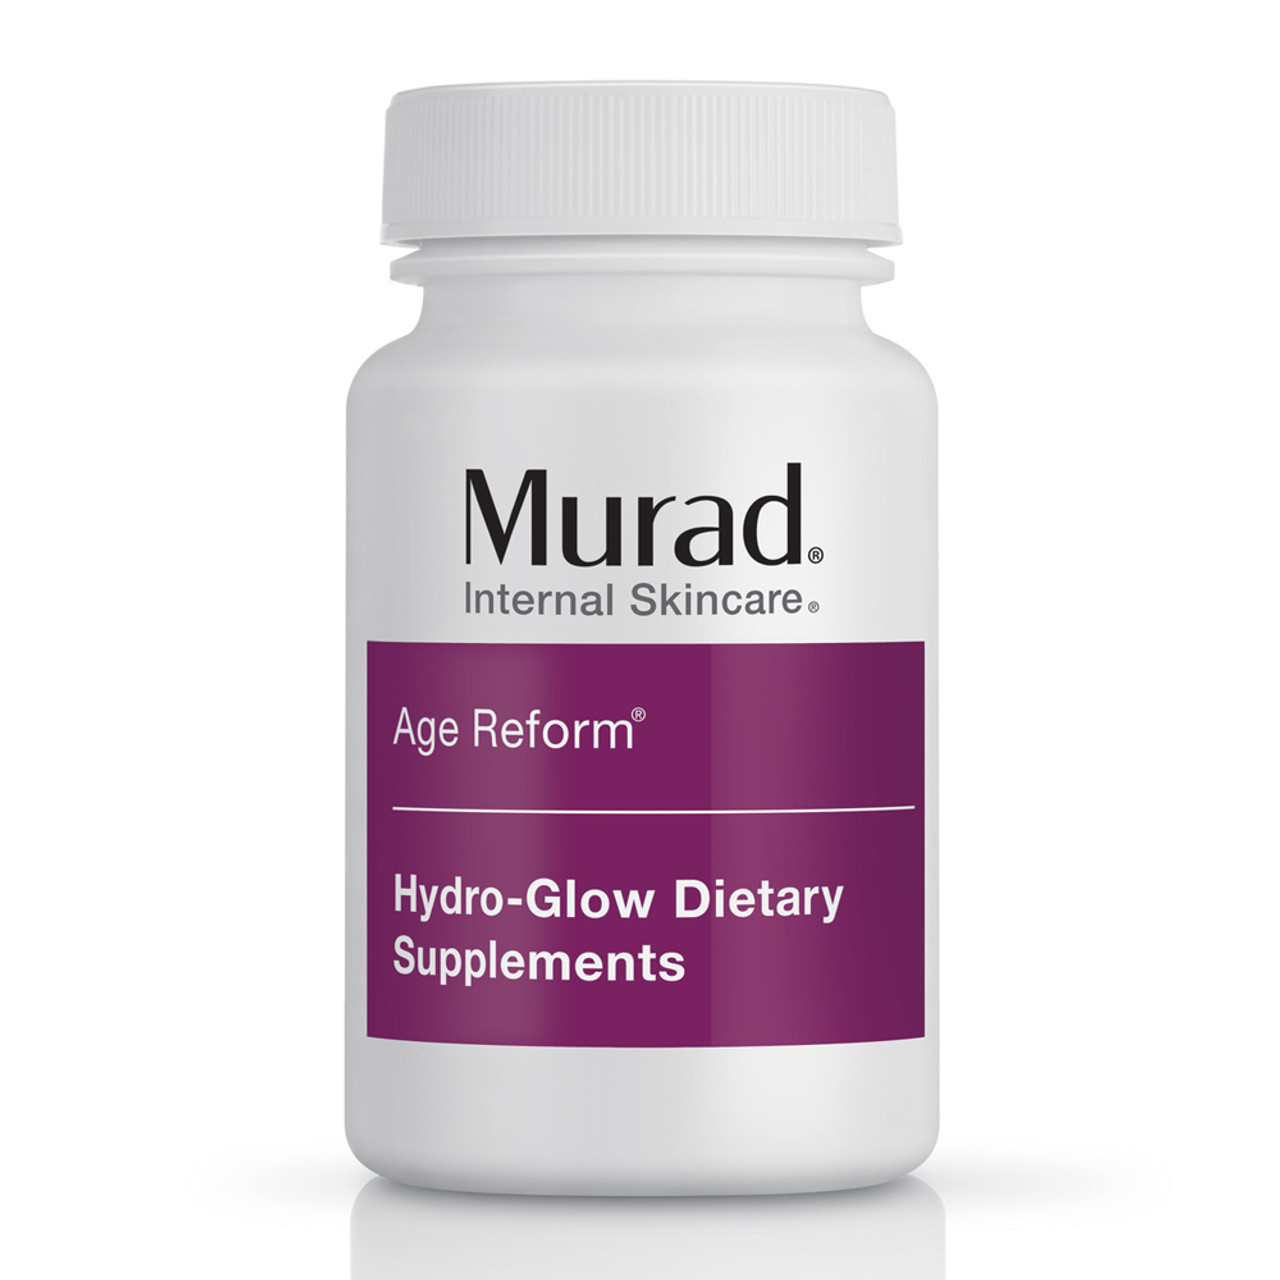 Murad Age Reform™ Hydro-Glow Dietary Supplements   BeautifiedYou.com